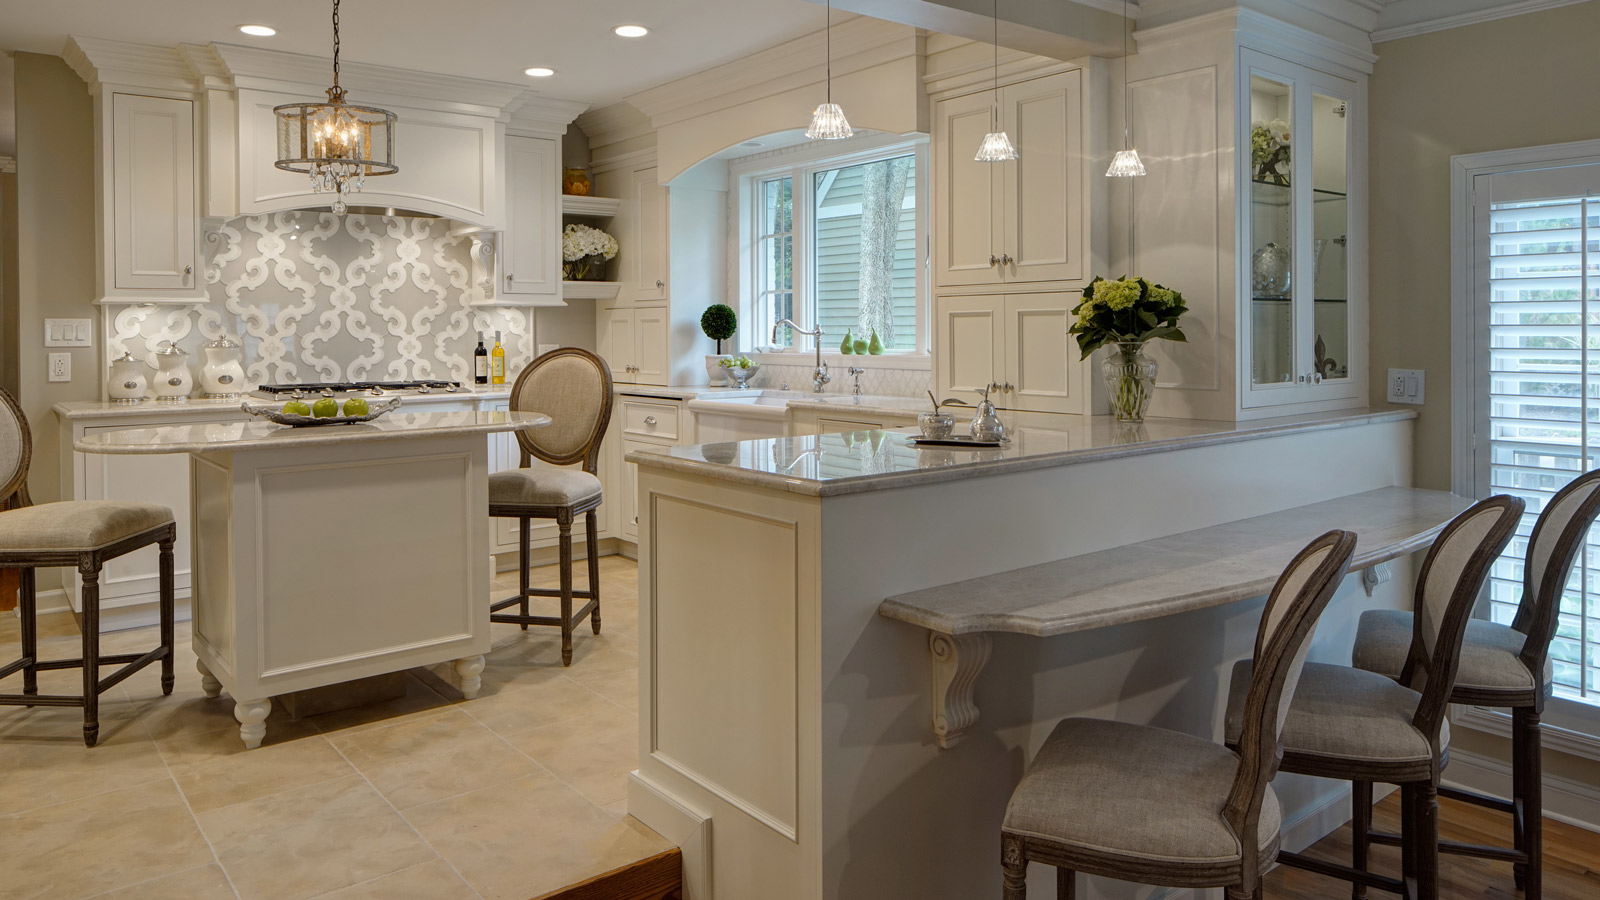 1600 x 900 Luxury Meets Character in Timeless Kitchen Design drury design